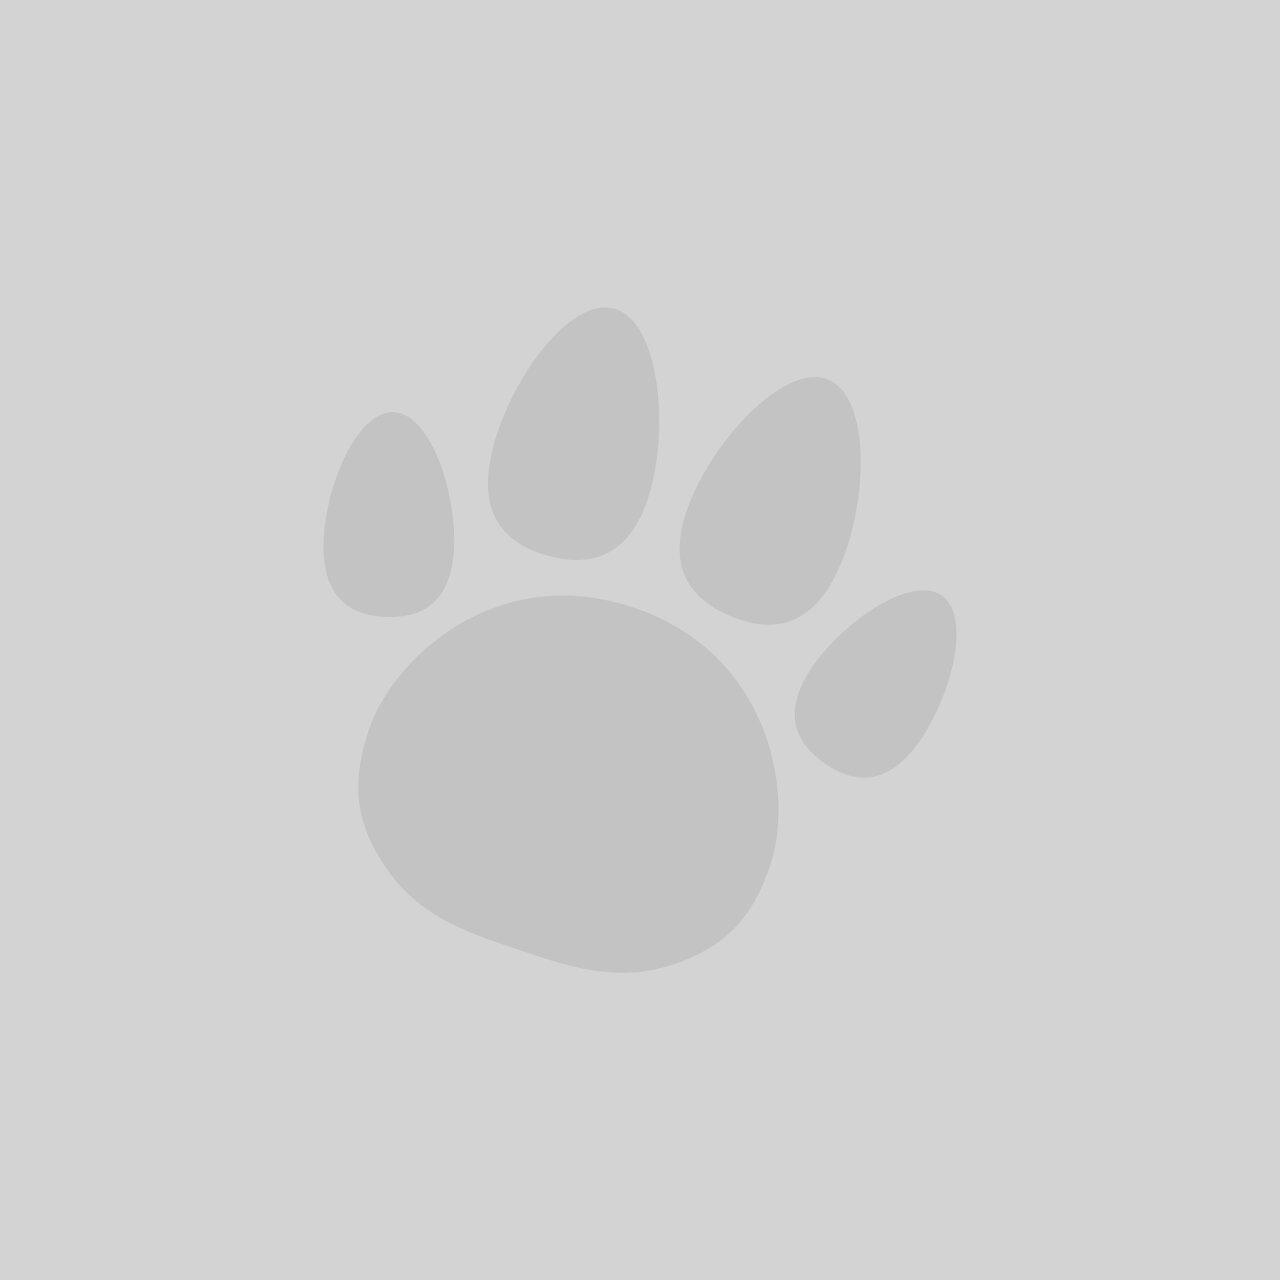 Greenies Grain Free Teenie Dog Treat 170g